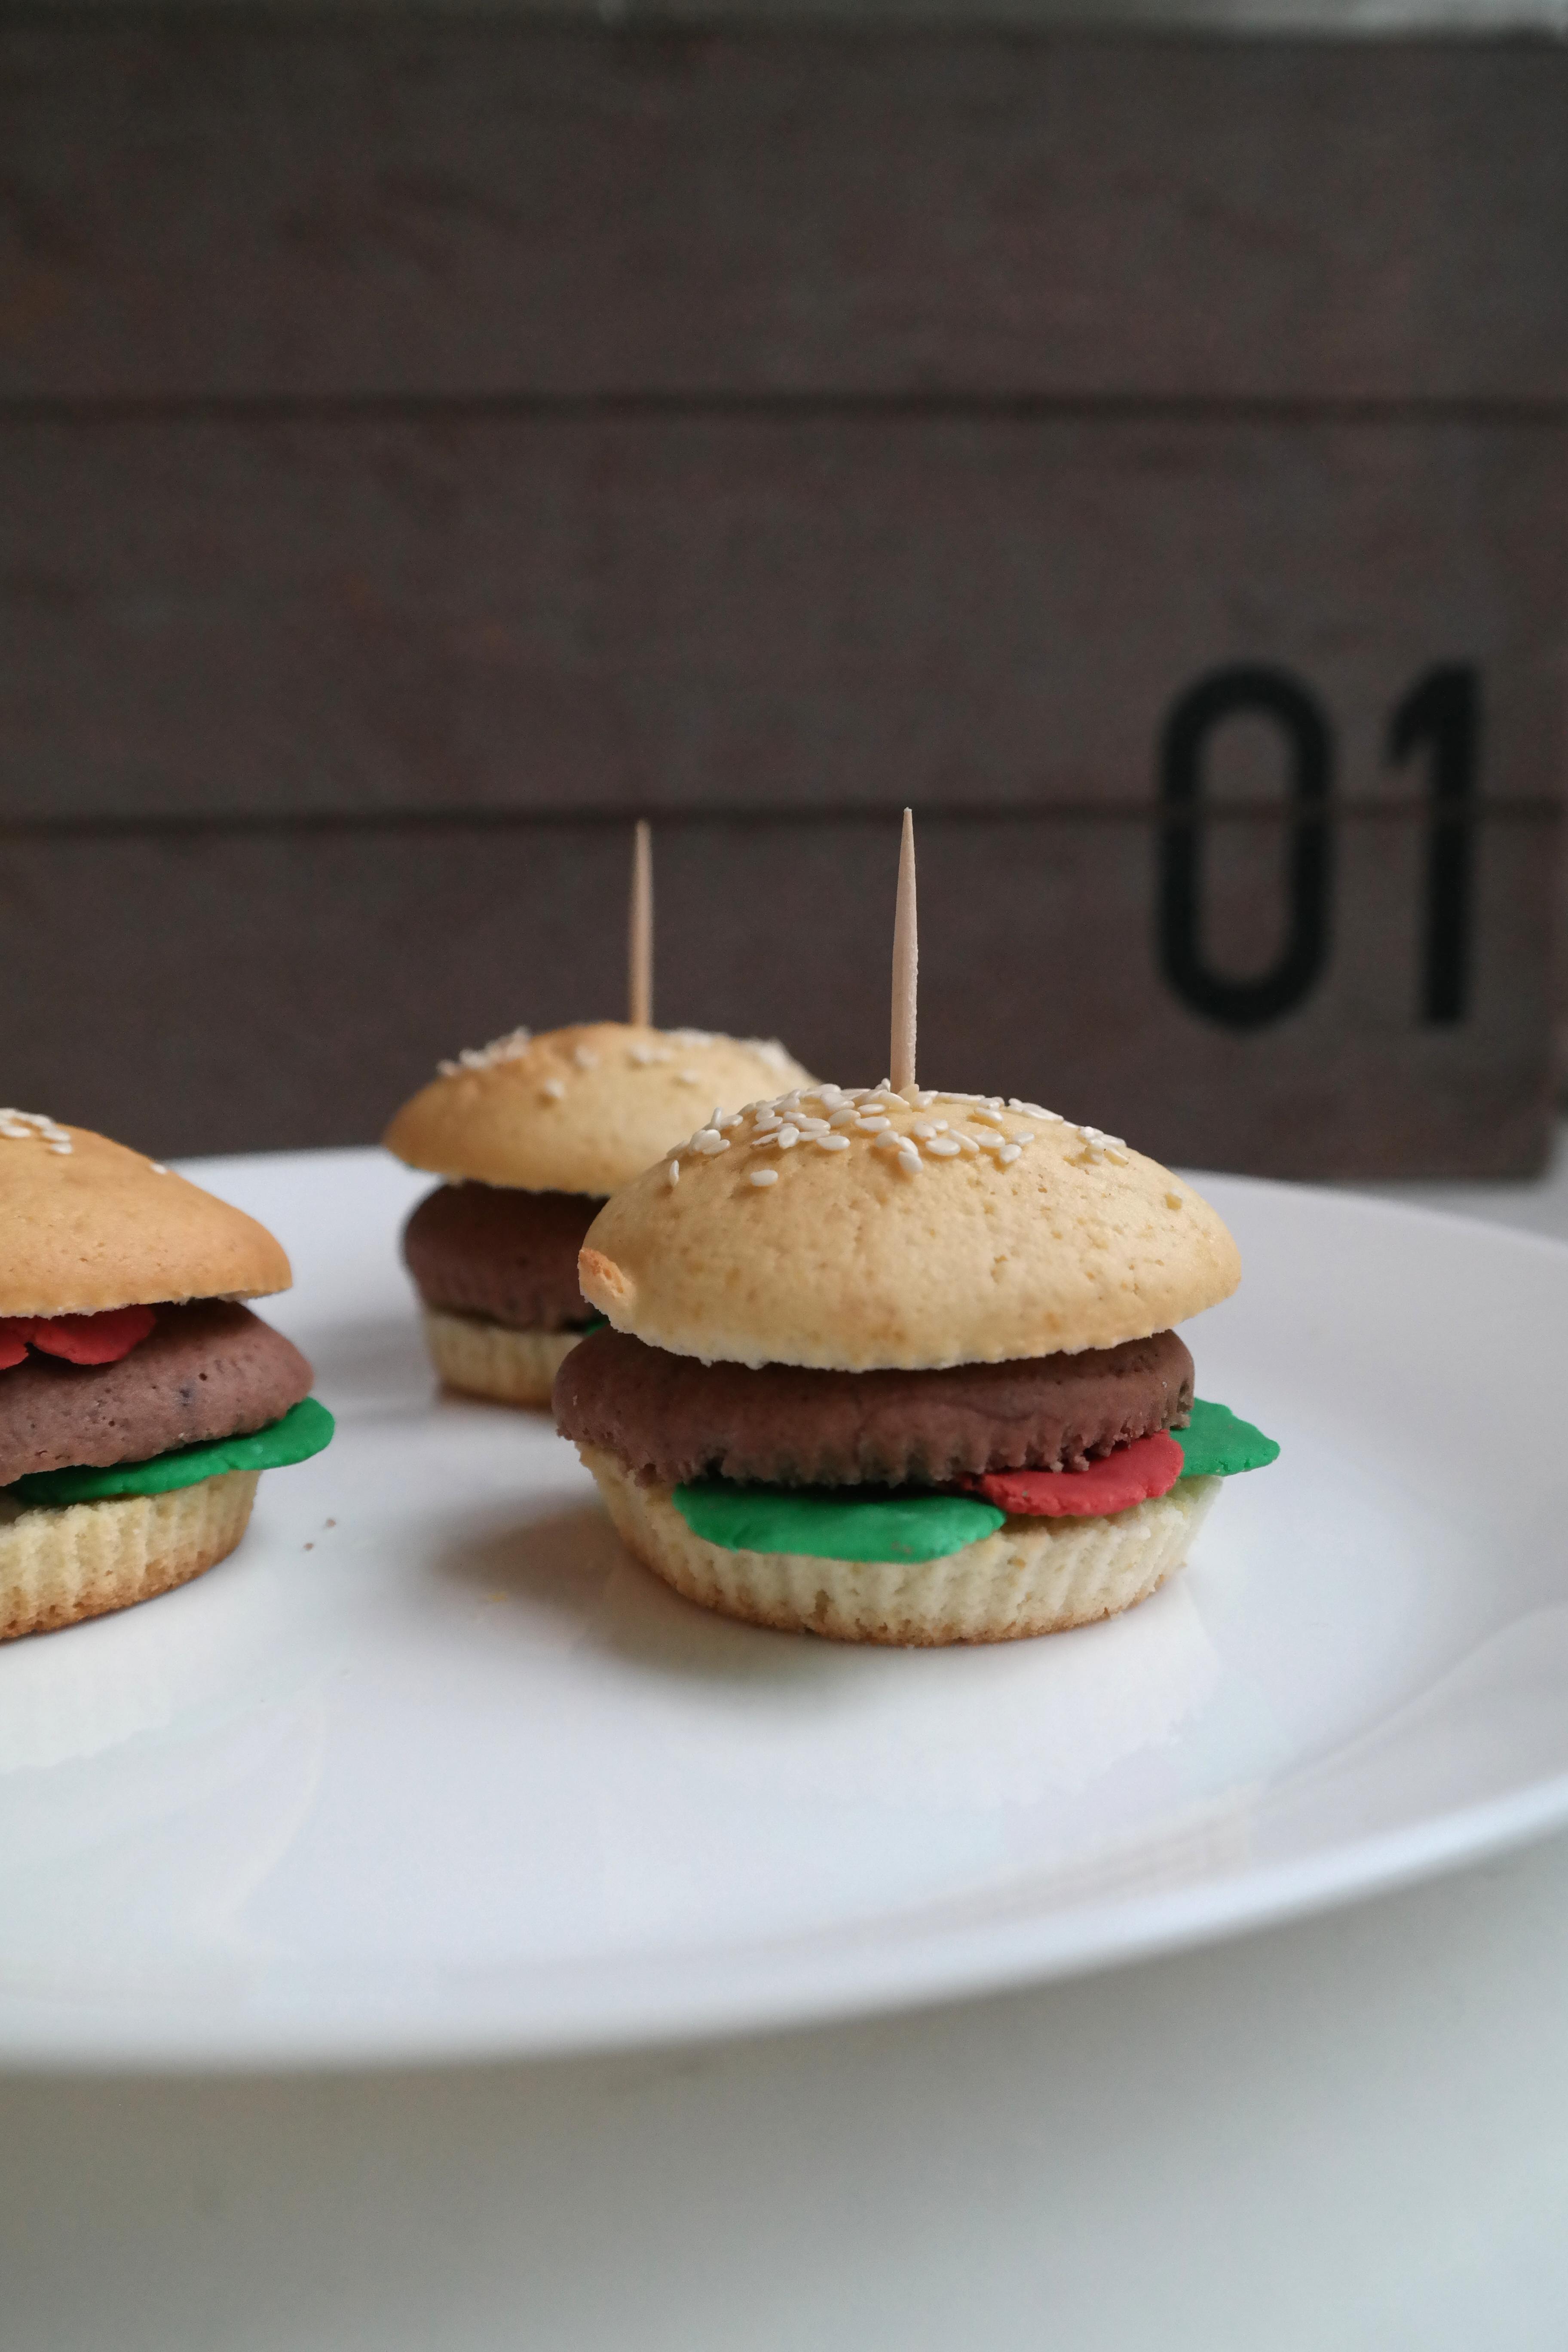 Kreative Burger-Muffins